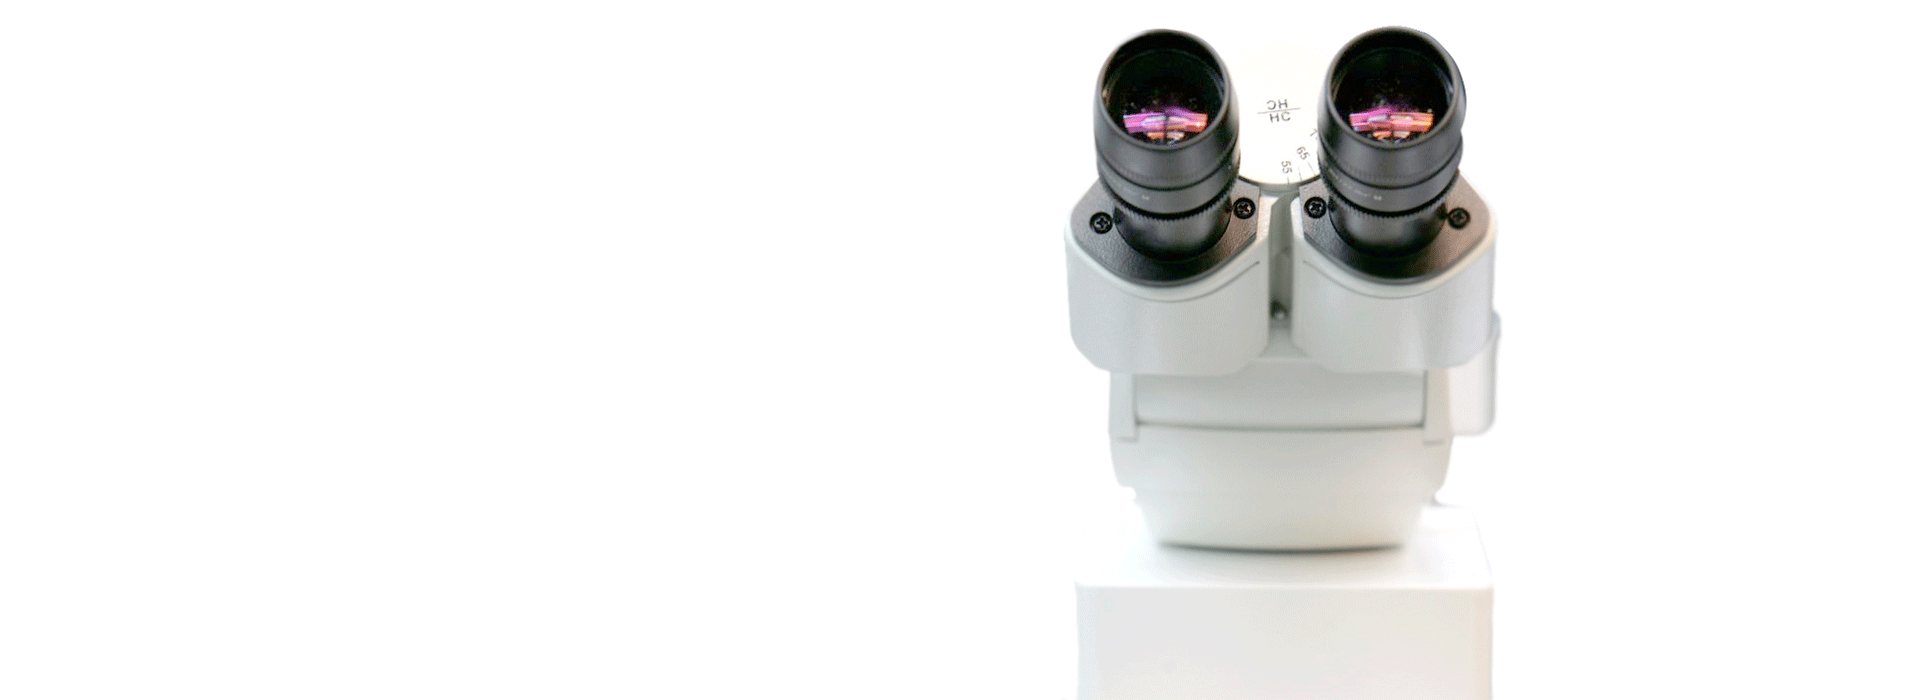 microscope_slider